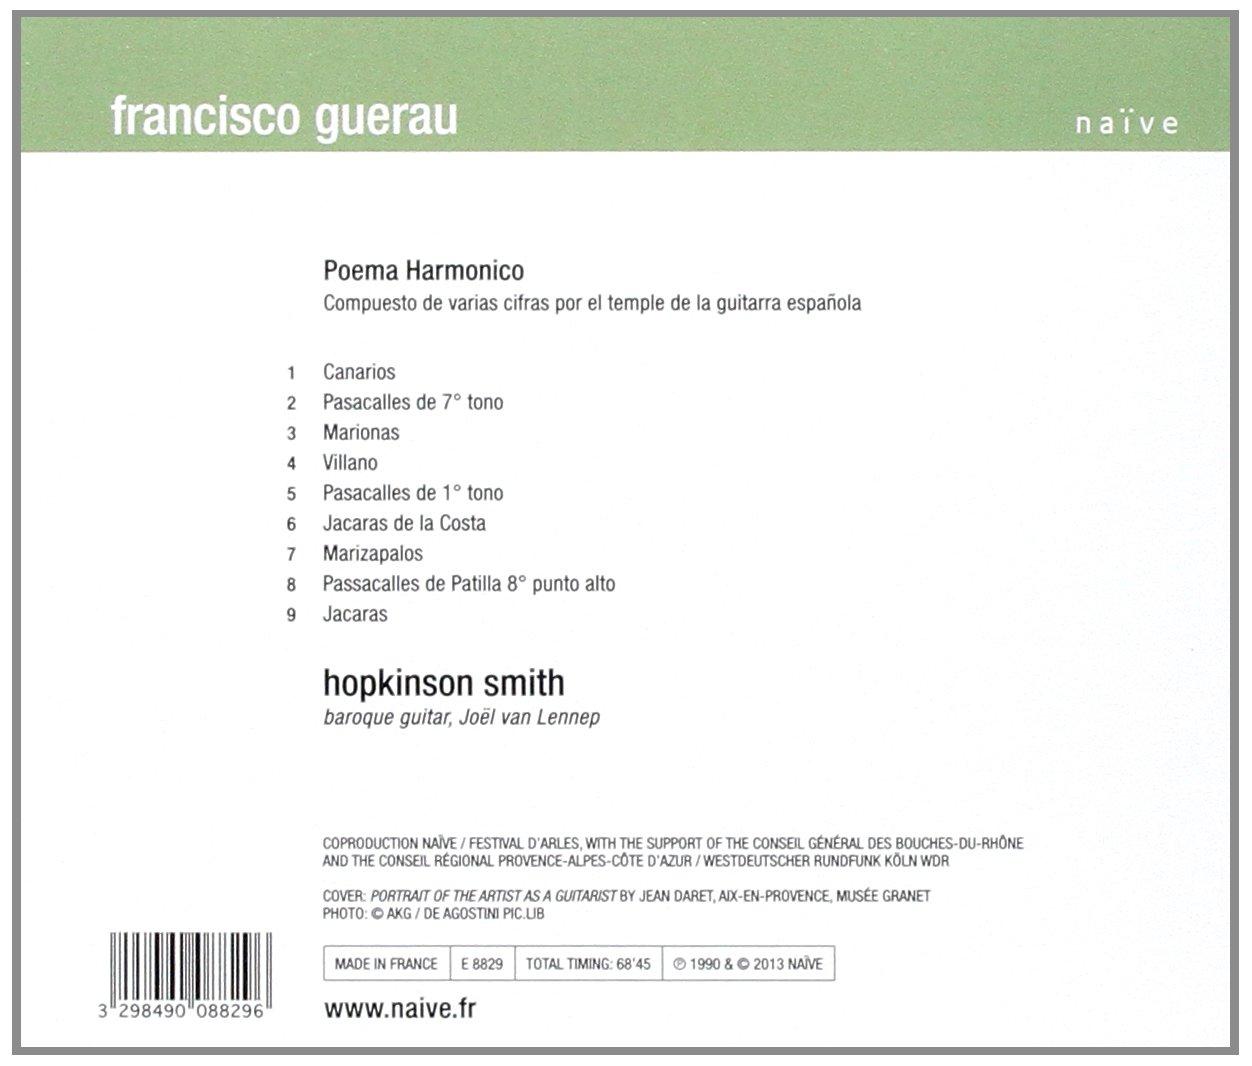 Guerau - Poema Harmonico: Hopkinson Smith: Hopkinson Smith ...